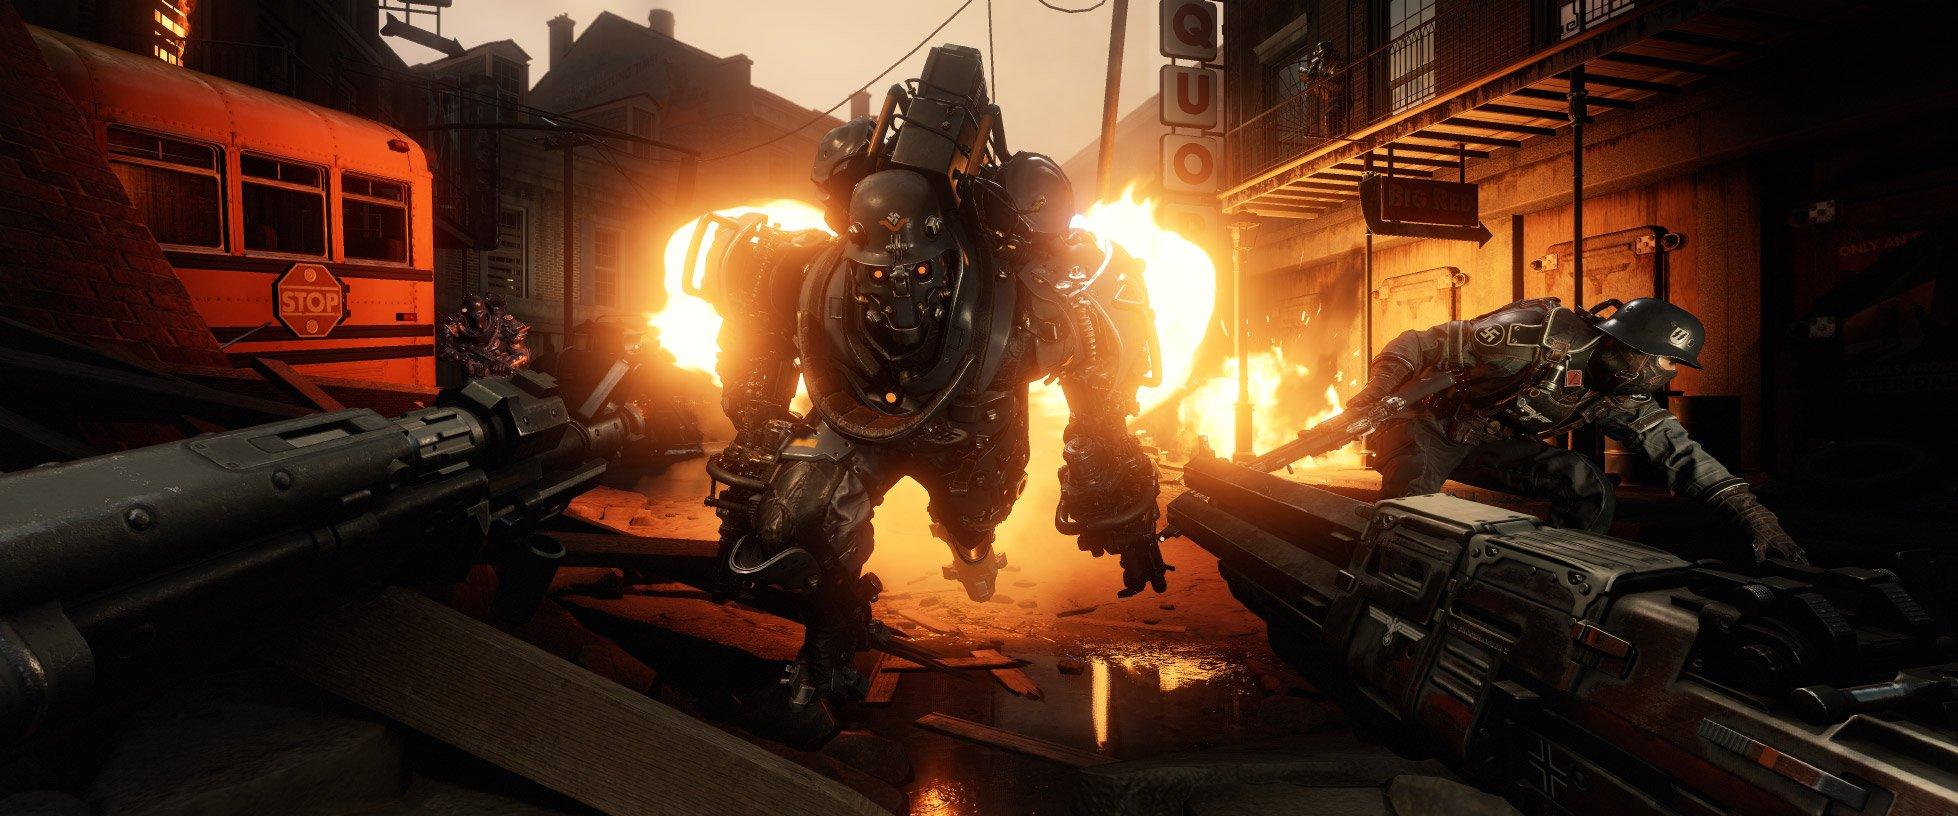 Wolfenstein 2: The New Colossus рецензия отвратительные мужики disgusting men